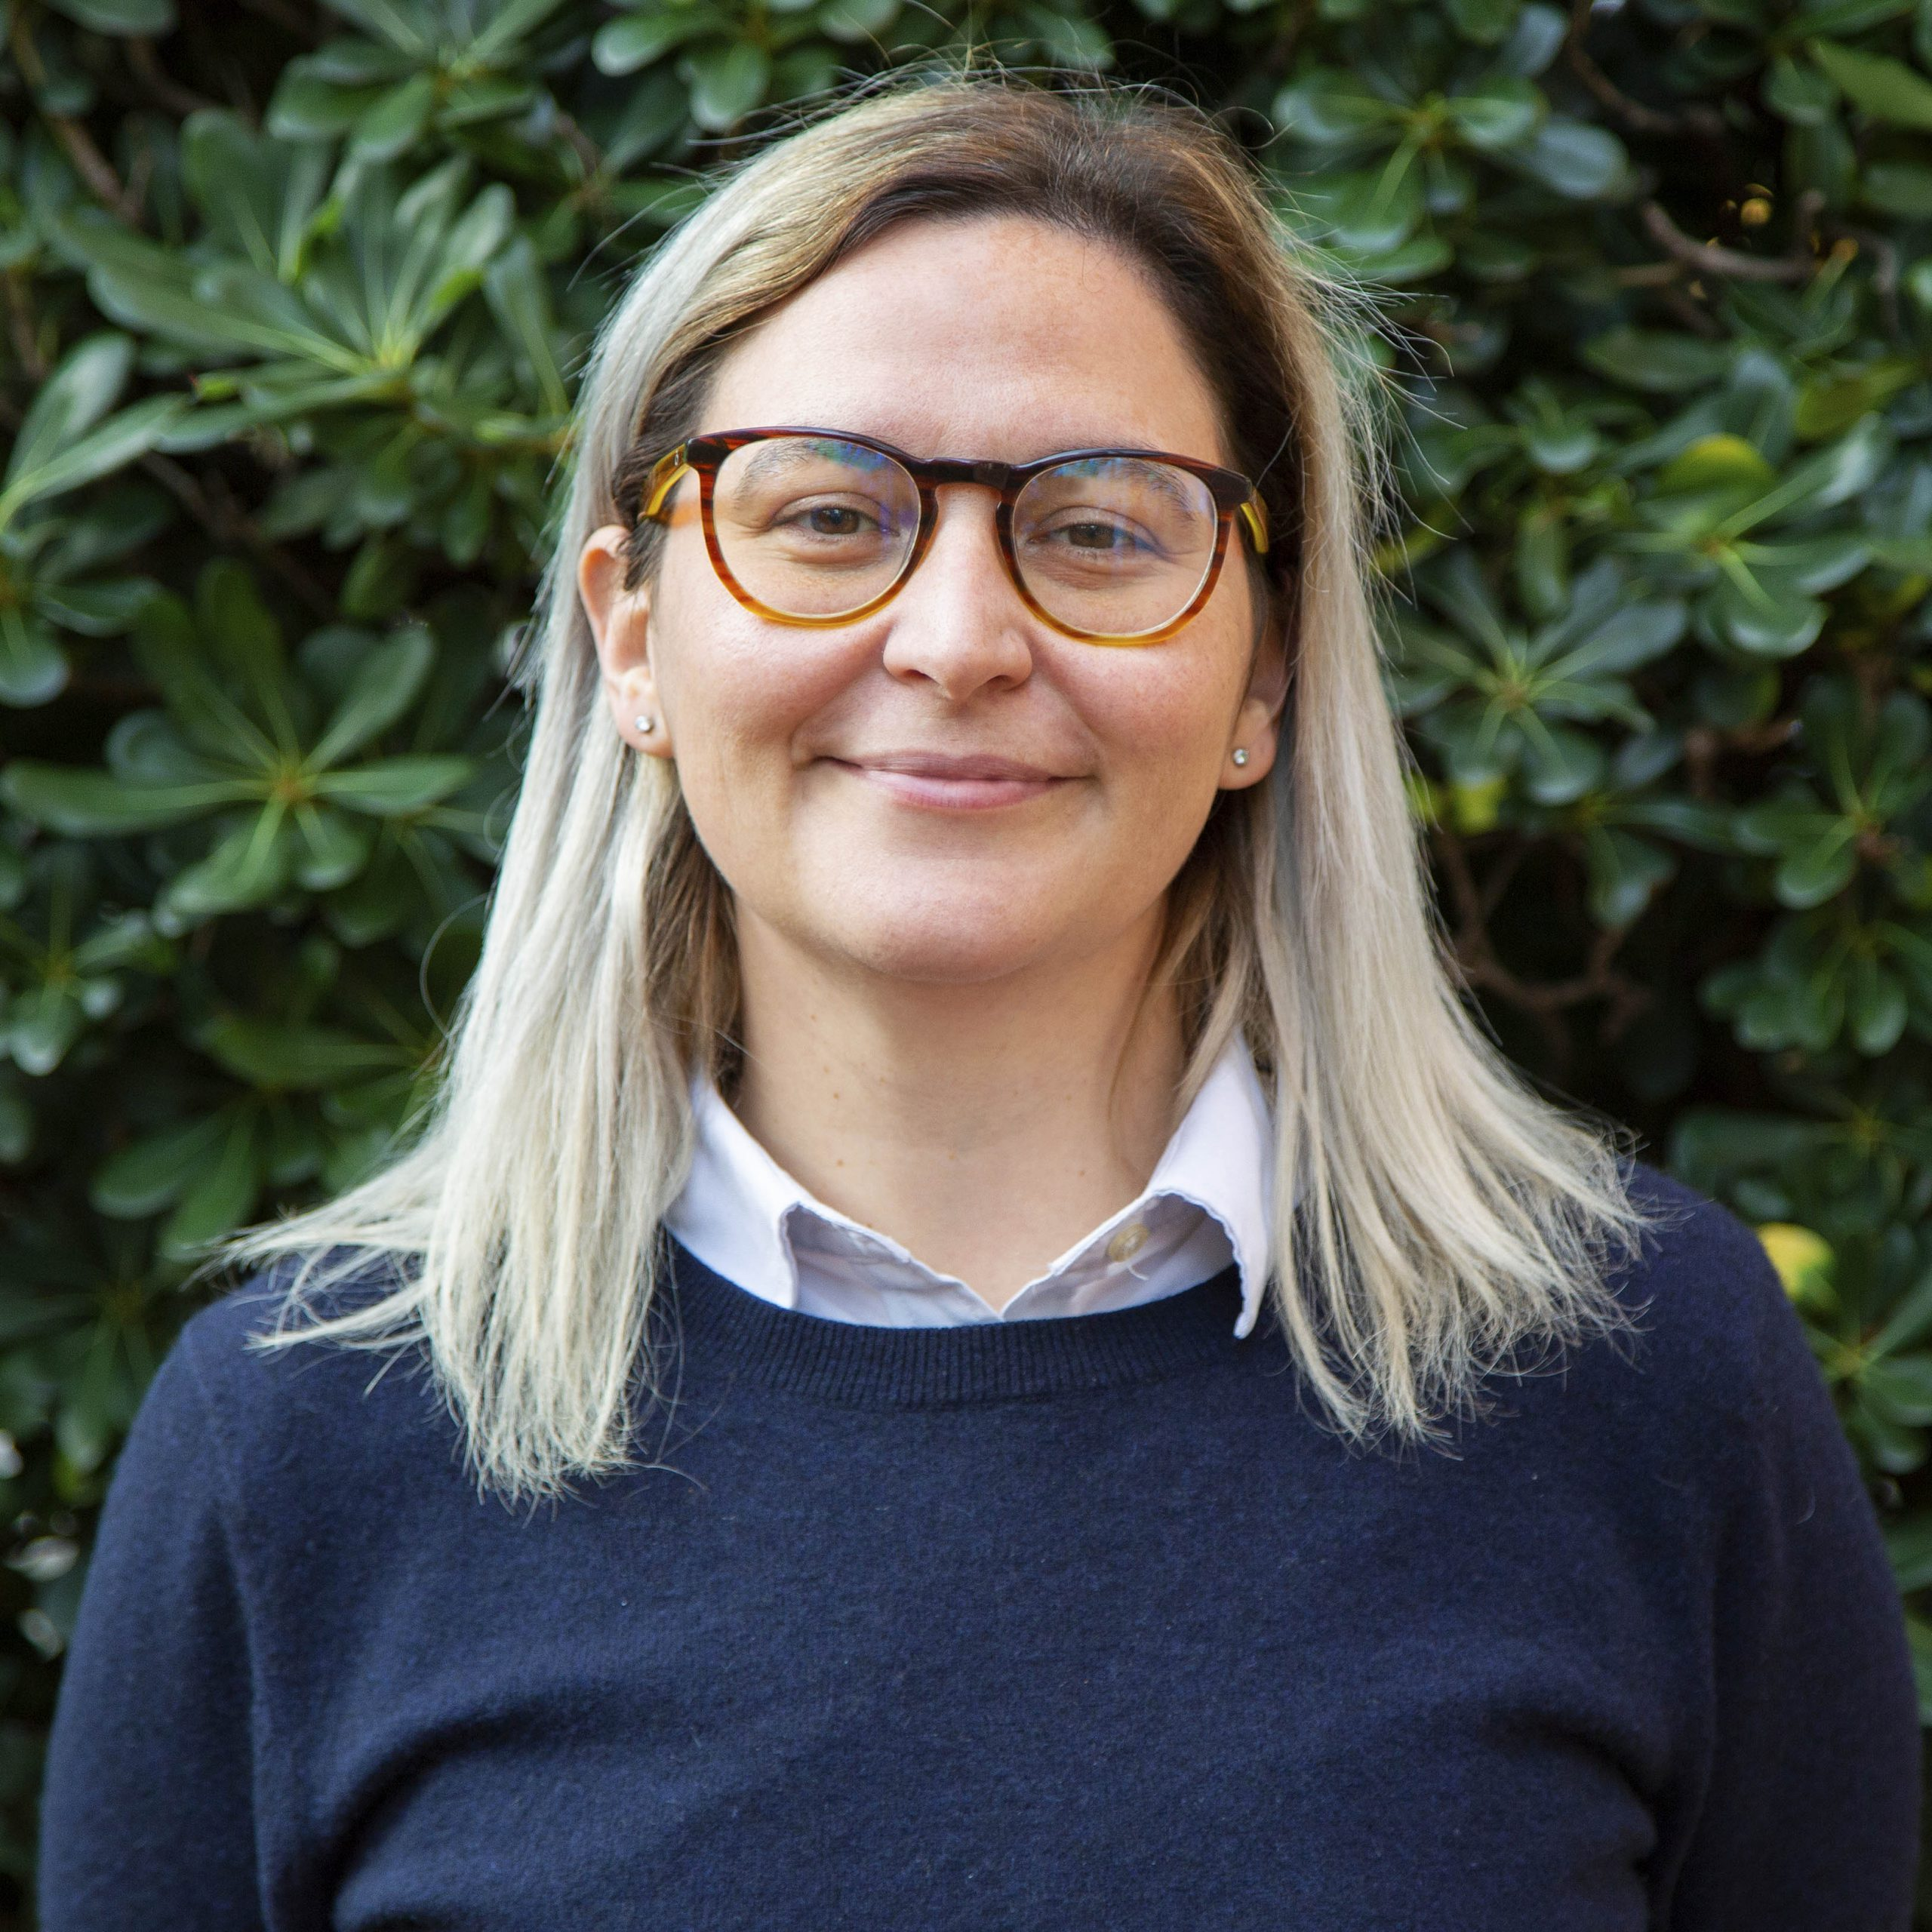 Serena Sardi